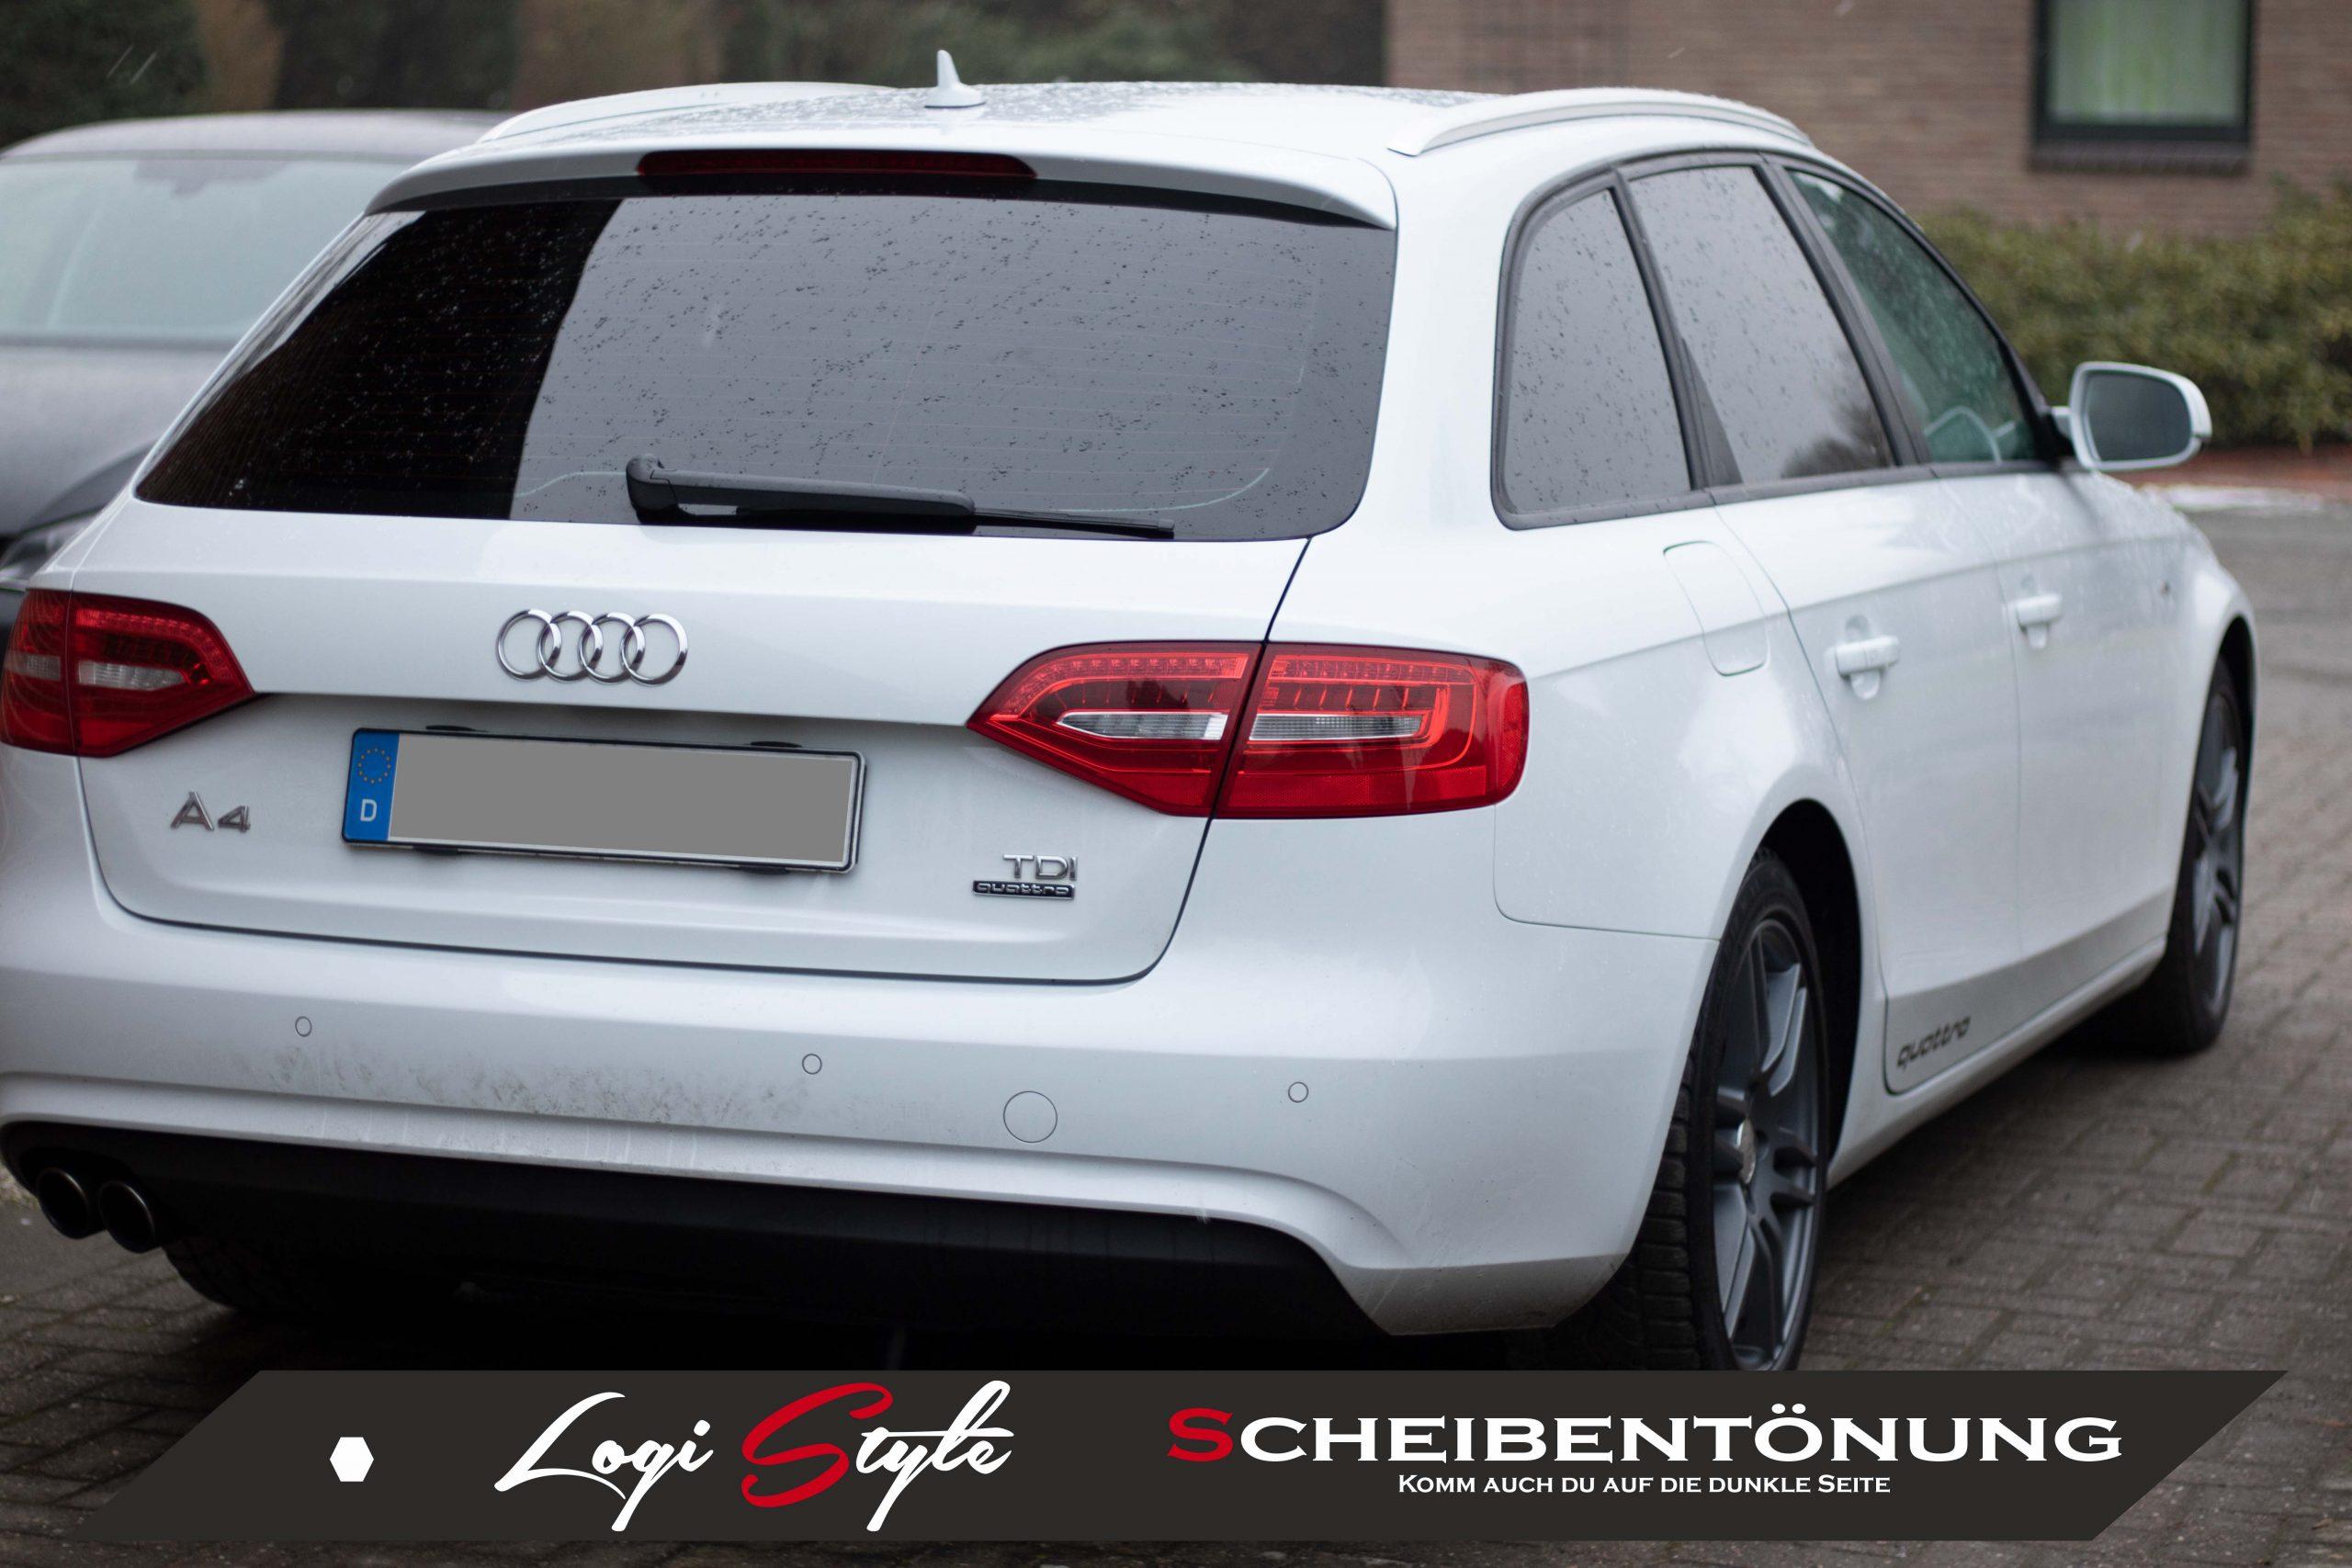 Scheibentönung Audi A4 Avant